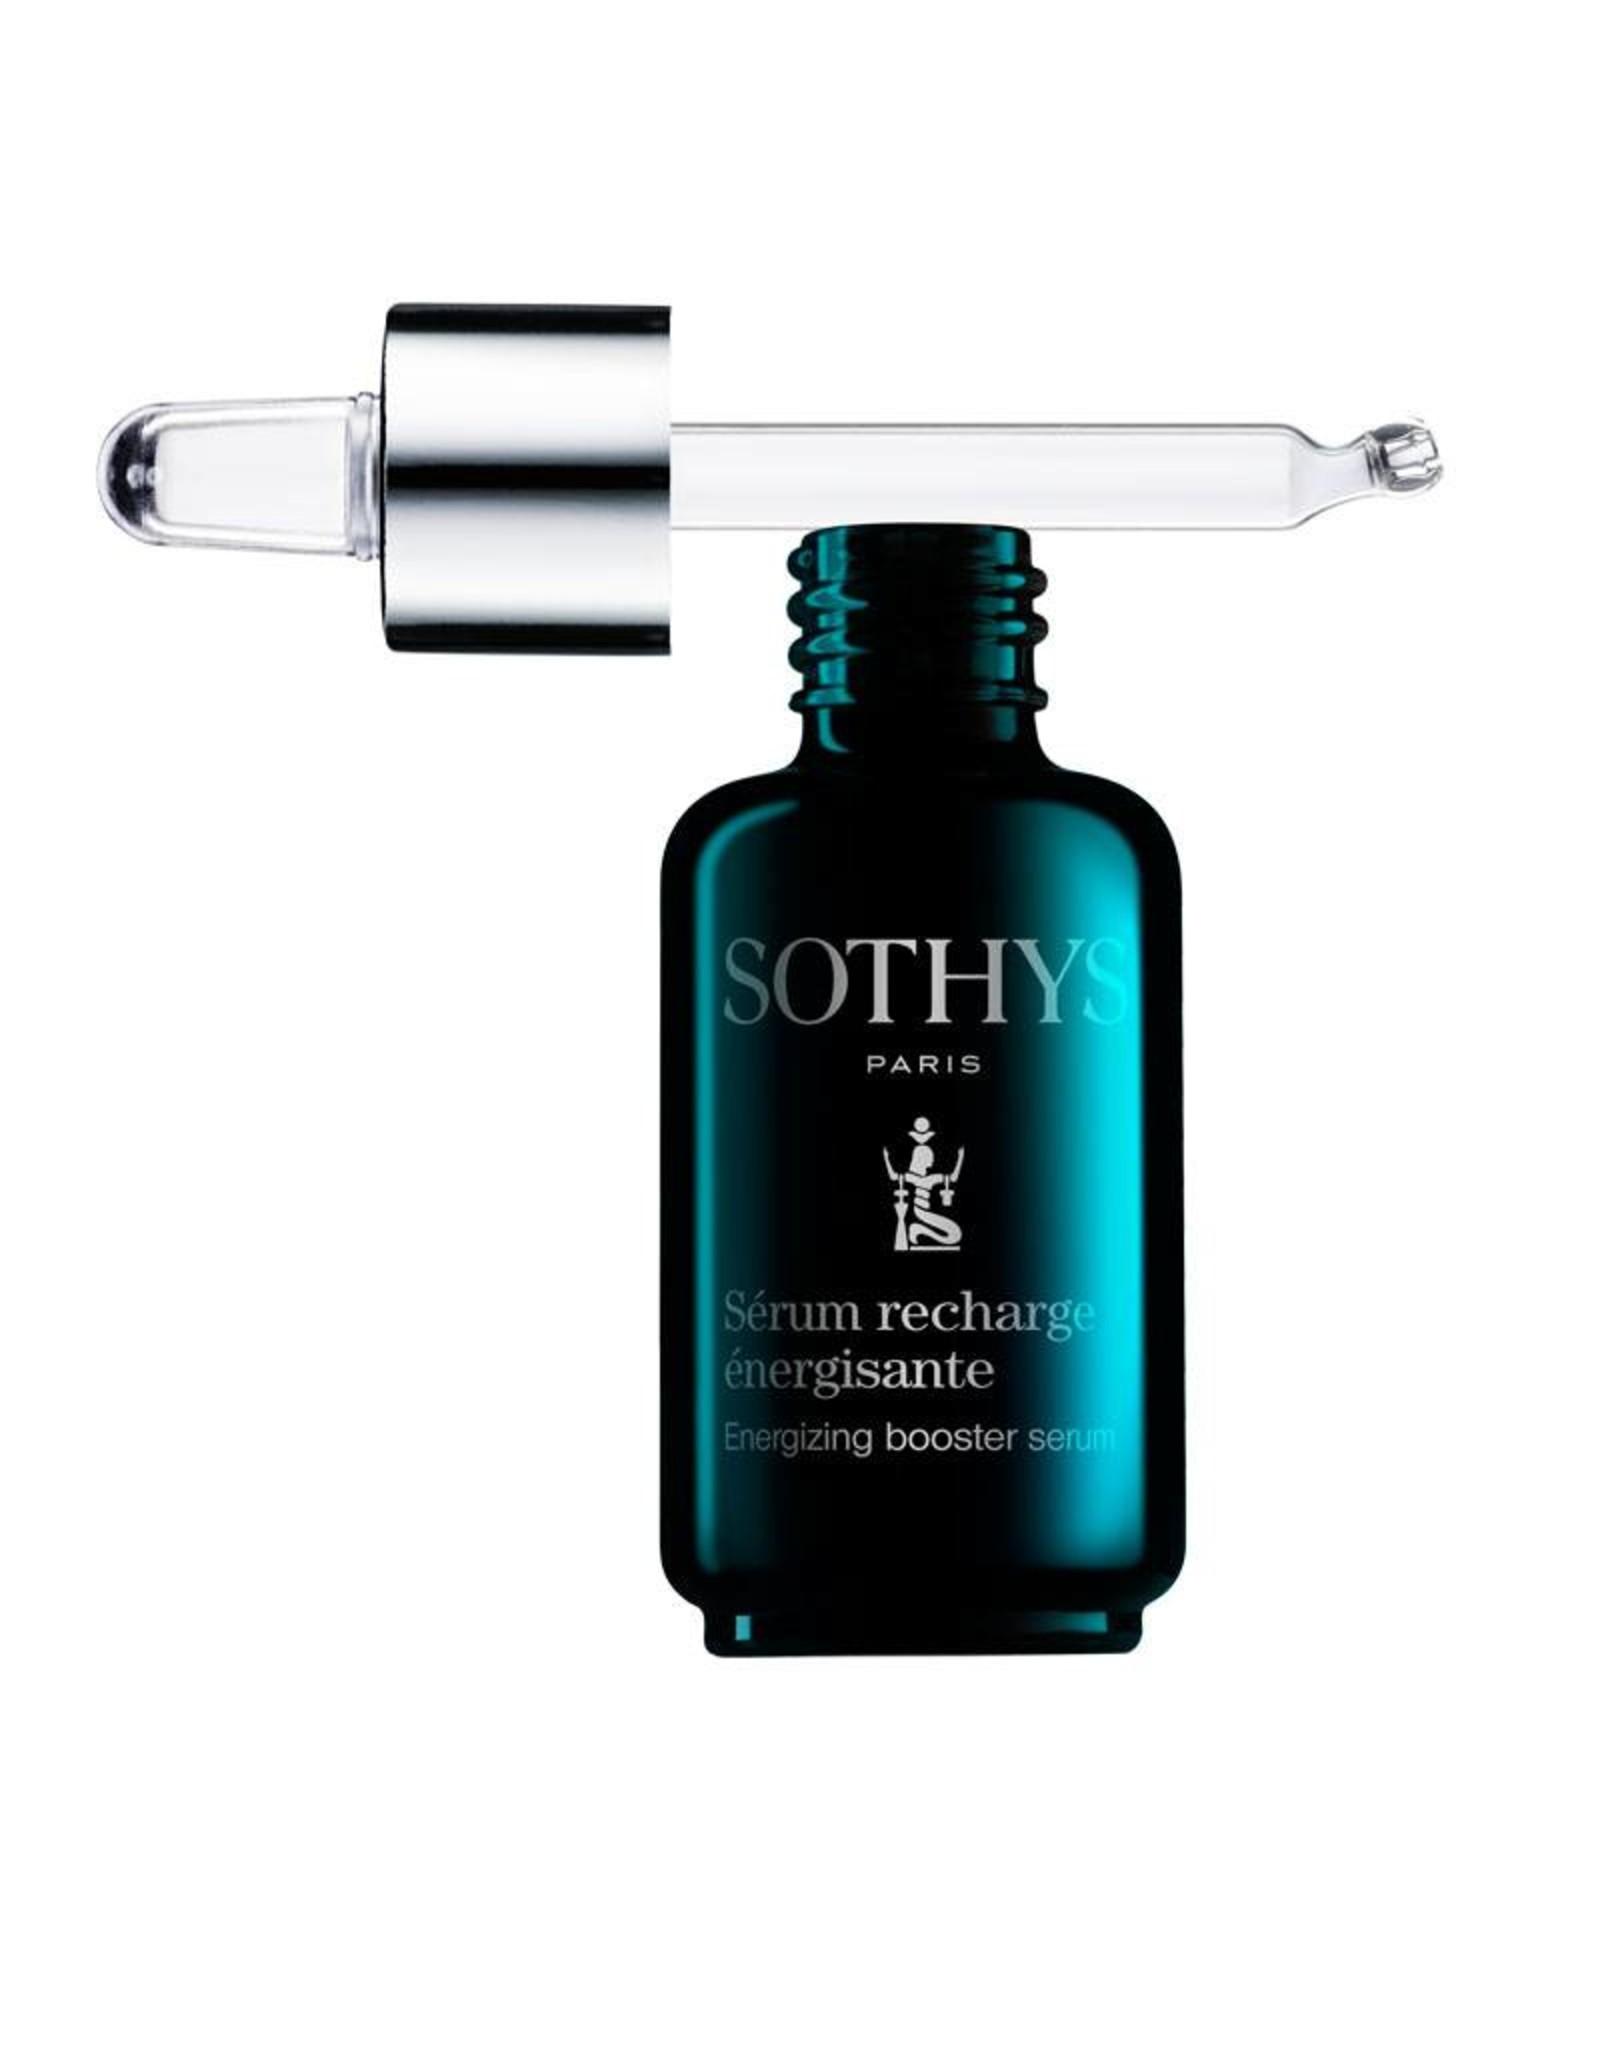 SOTHYS -20% Sérum recharge énergisante - Sothys